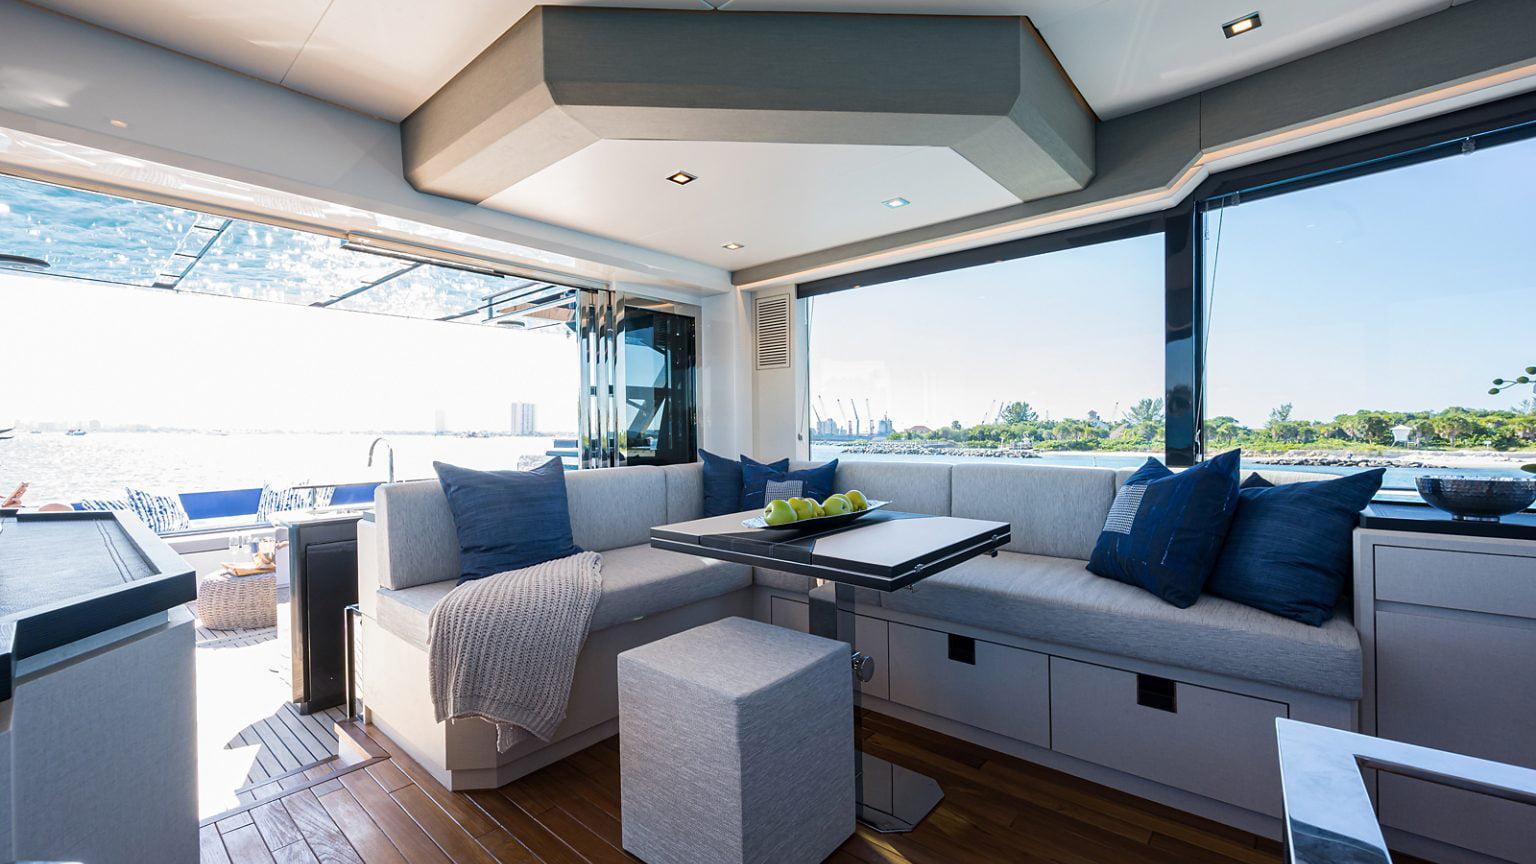 Okean 50X - interiores (6)